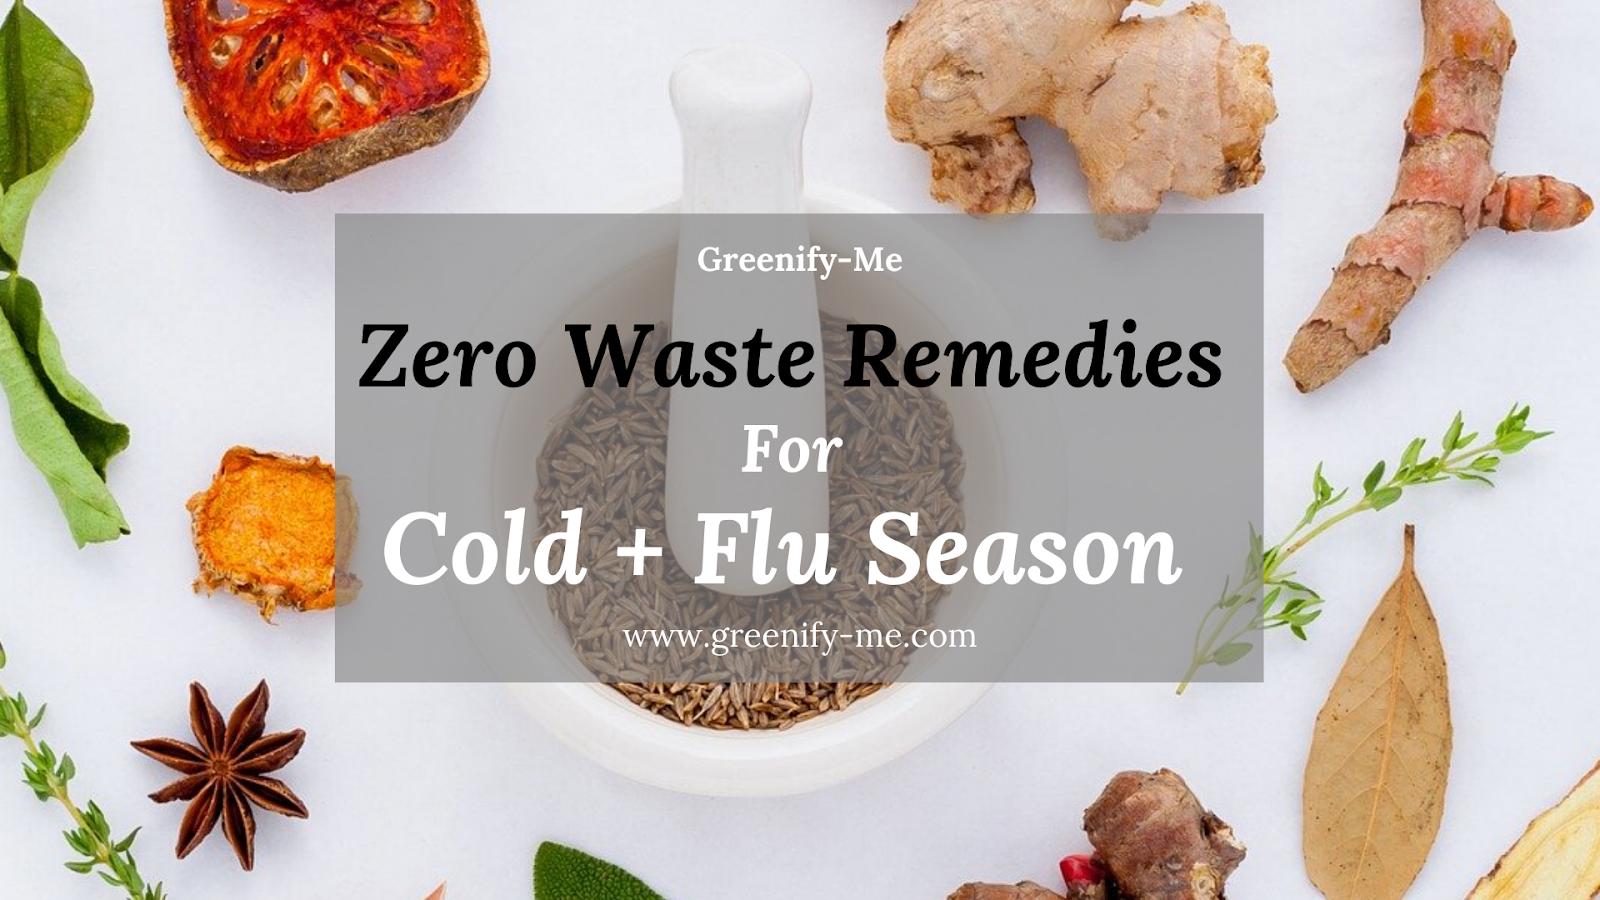 Zero Waste Remedies for Cold + Flu Season